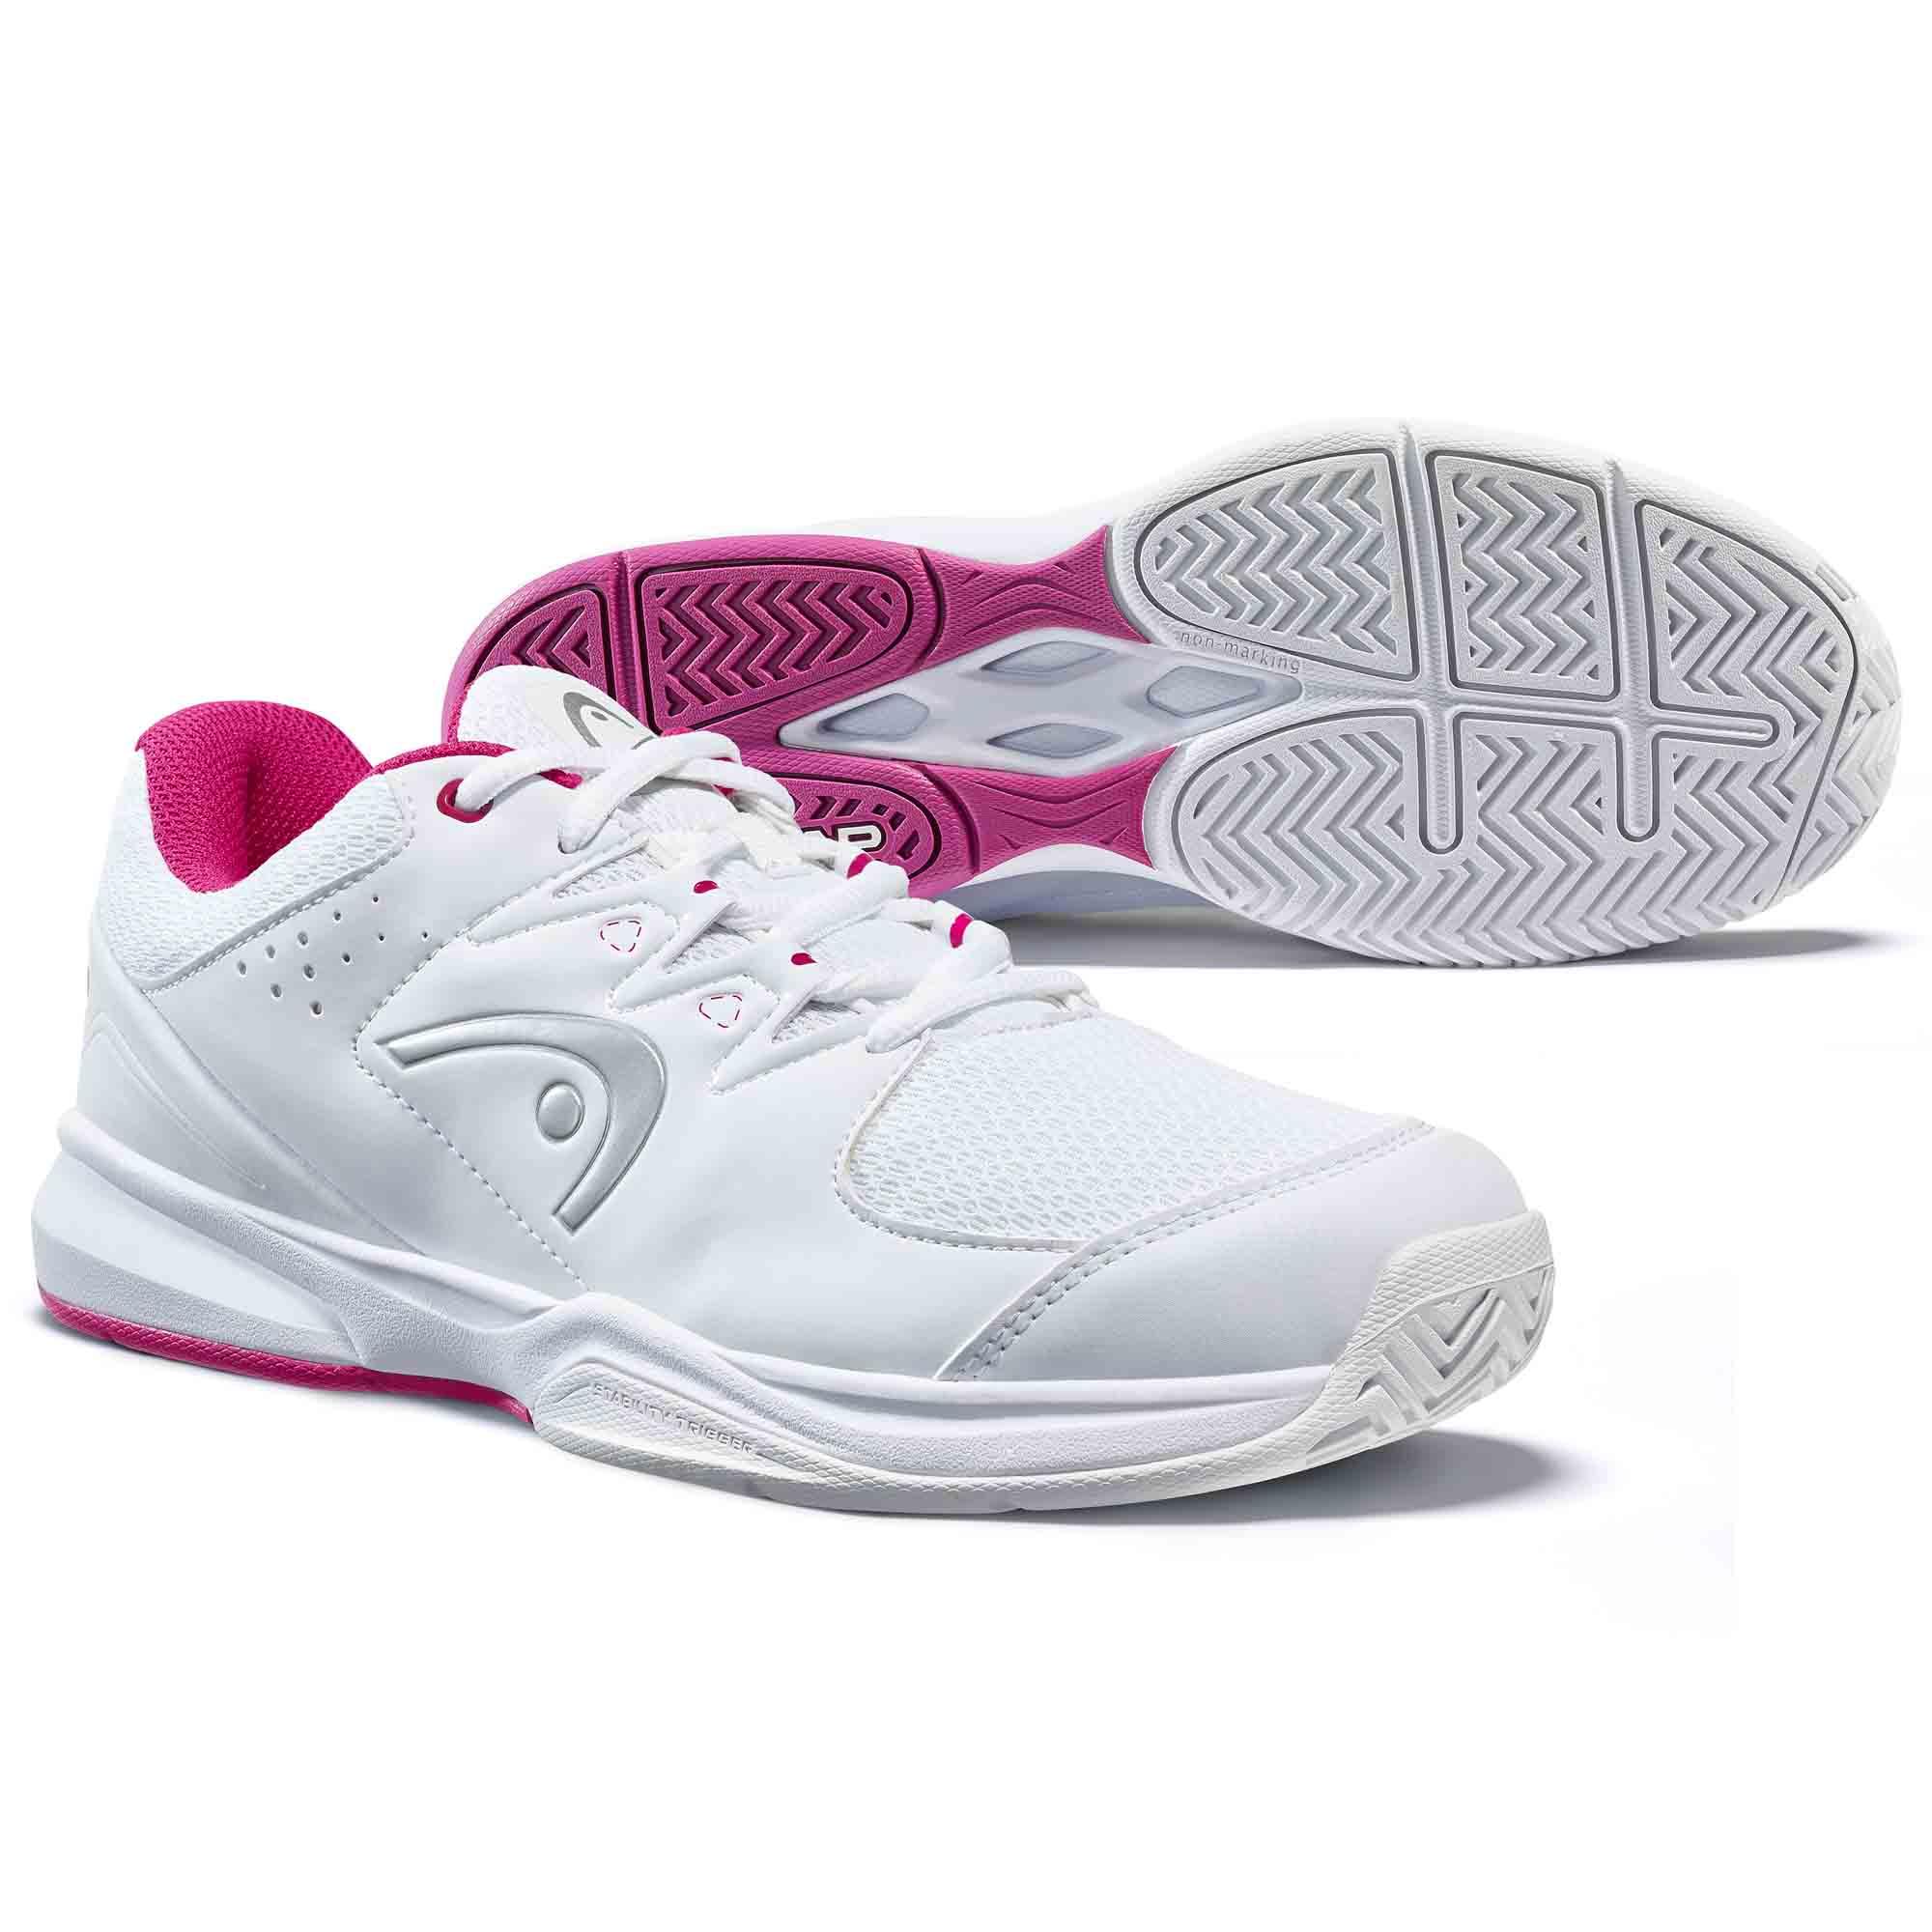 Head Brazer 2.0 Ladies Tennis Shoes - White/Violet, 5.5 UK